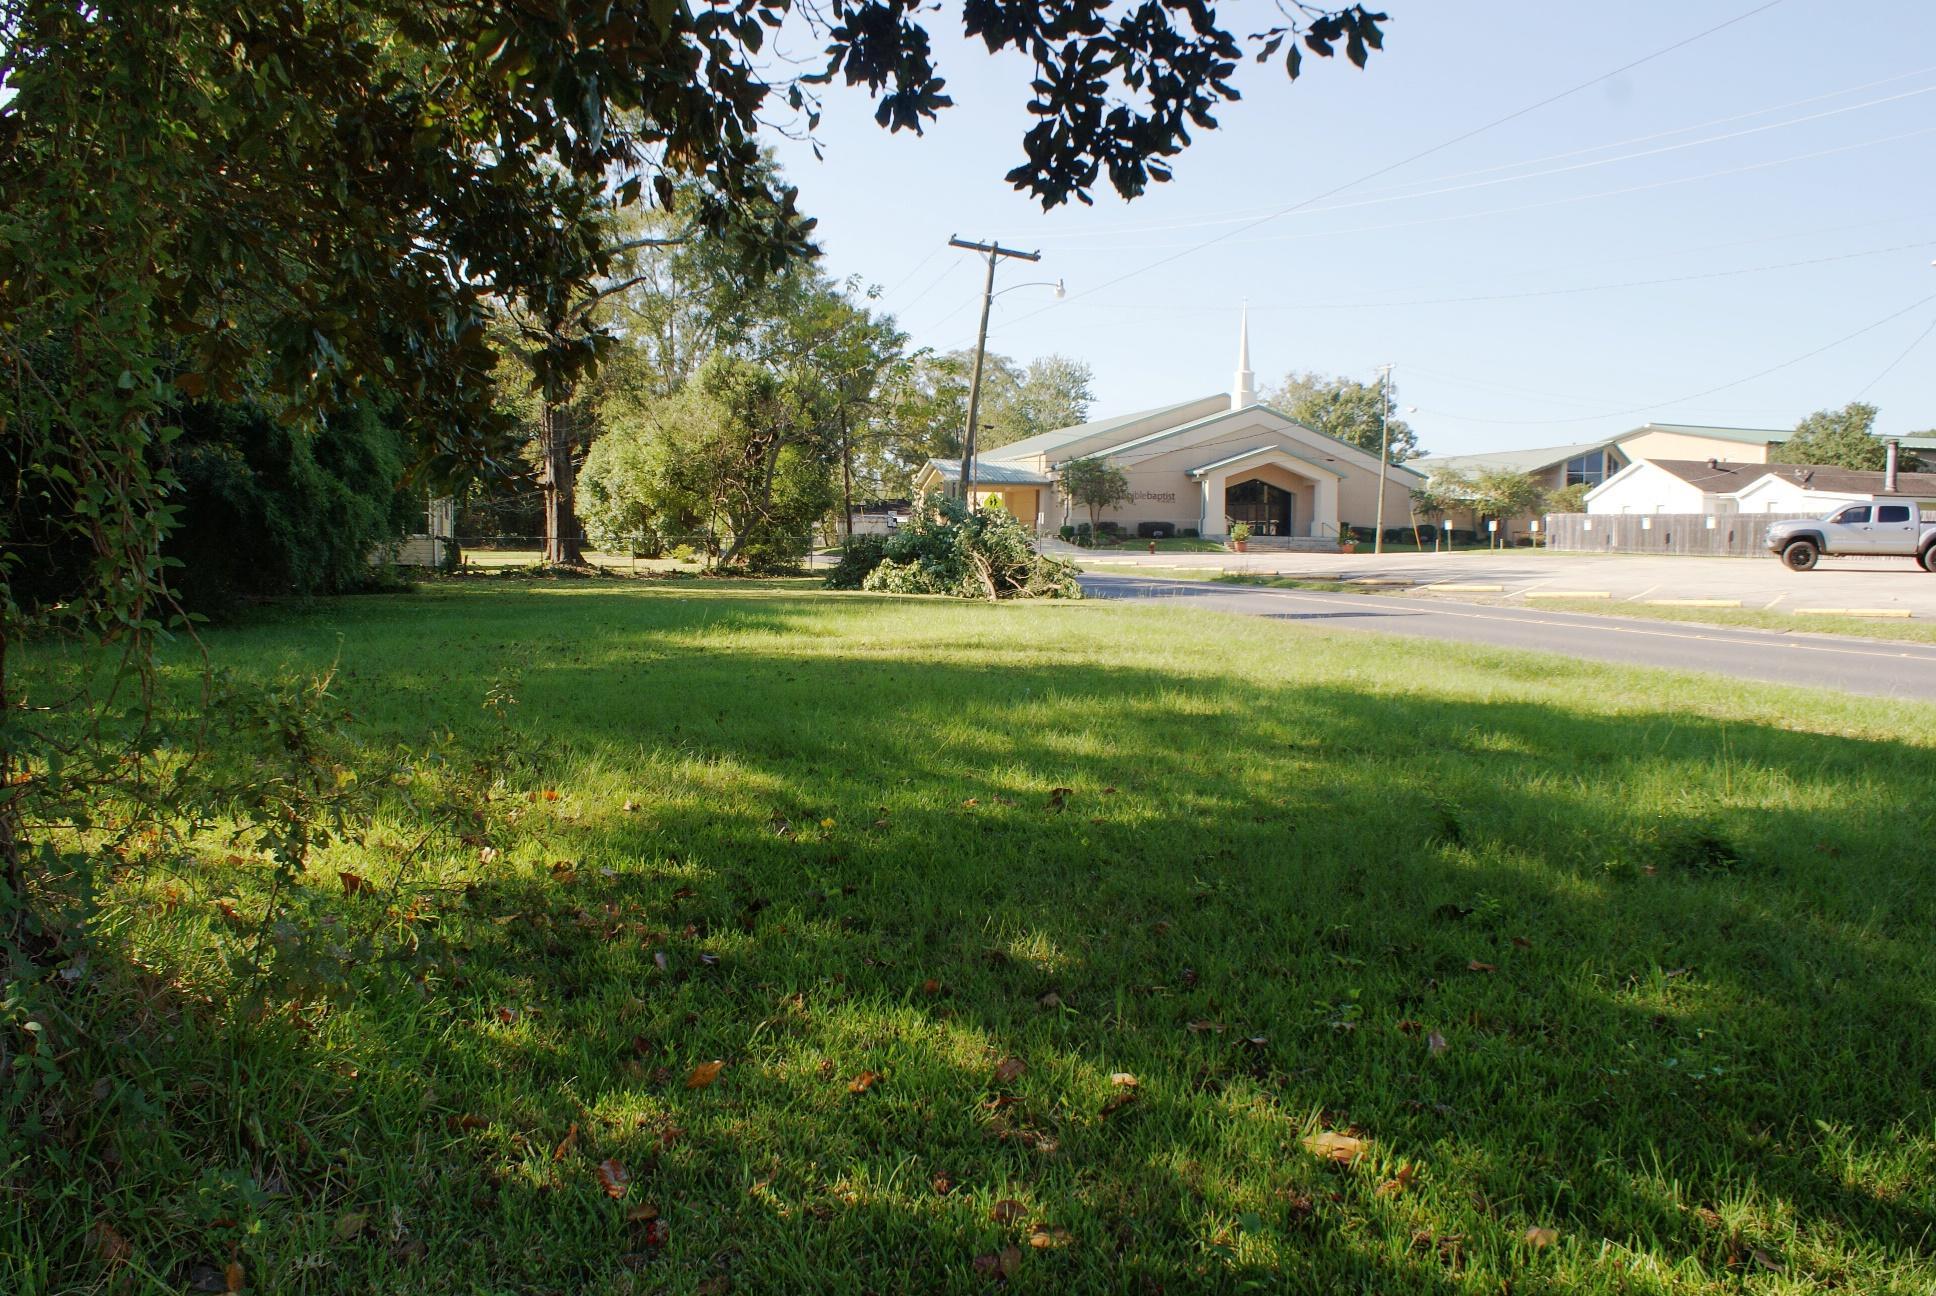 DeQuincy land for sale,  Page St, DeQuincy LA - $25,000